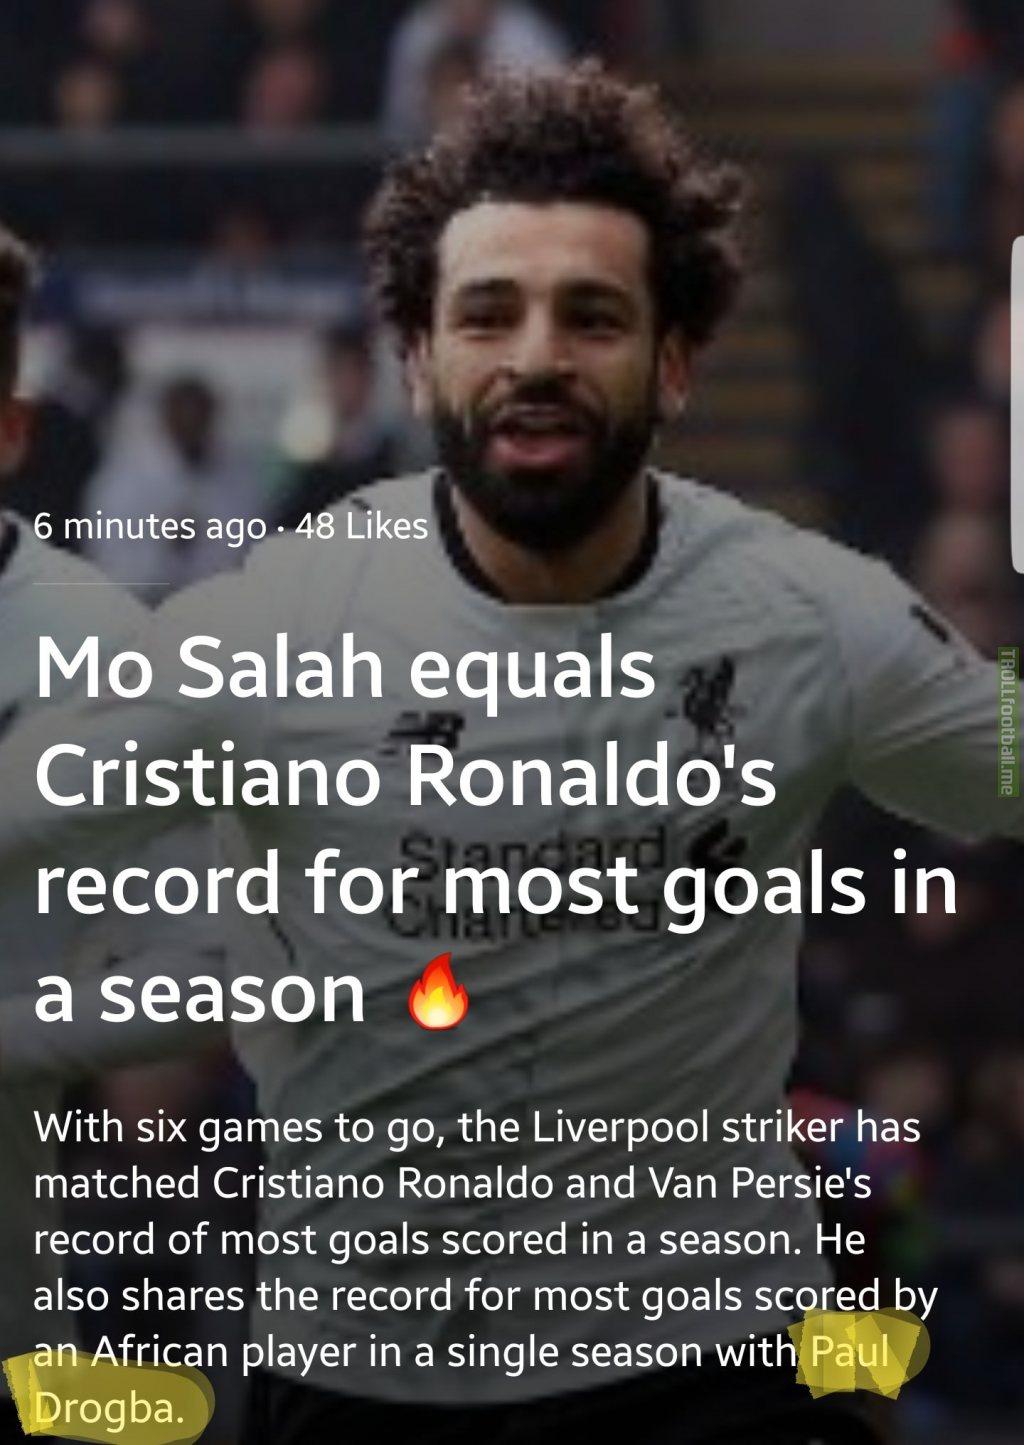 Fair play to Salah, Paul Drogba was a legend